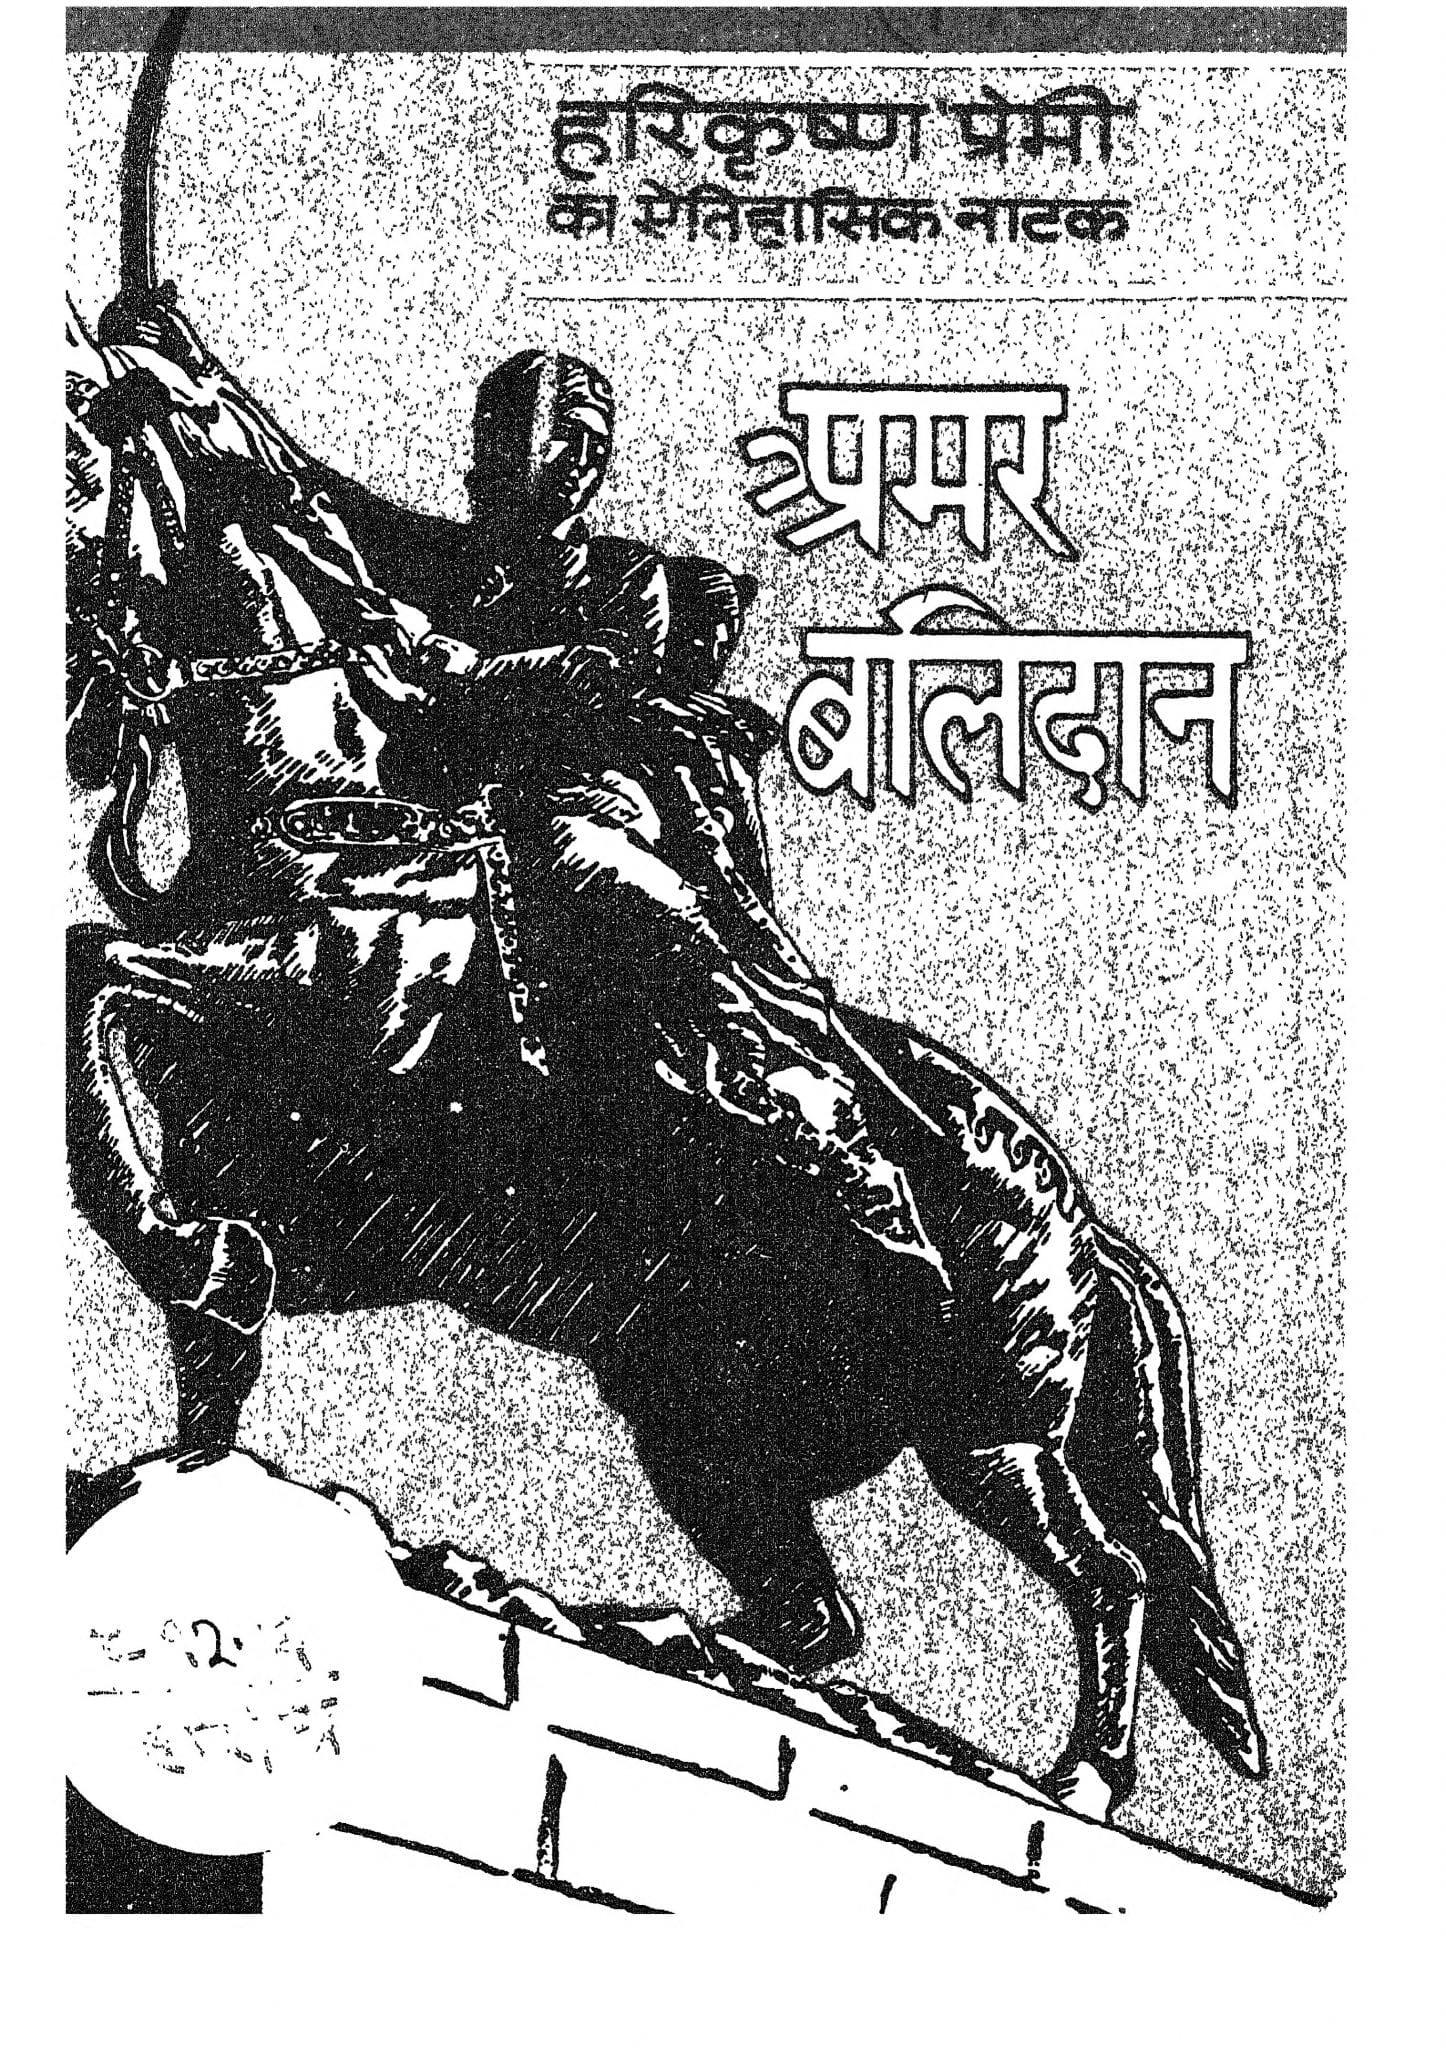 pramar balidan by श्री हरिकृष्ण प्रेमी - Shri Harikrishna Premee